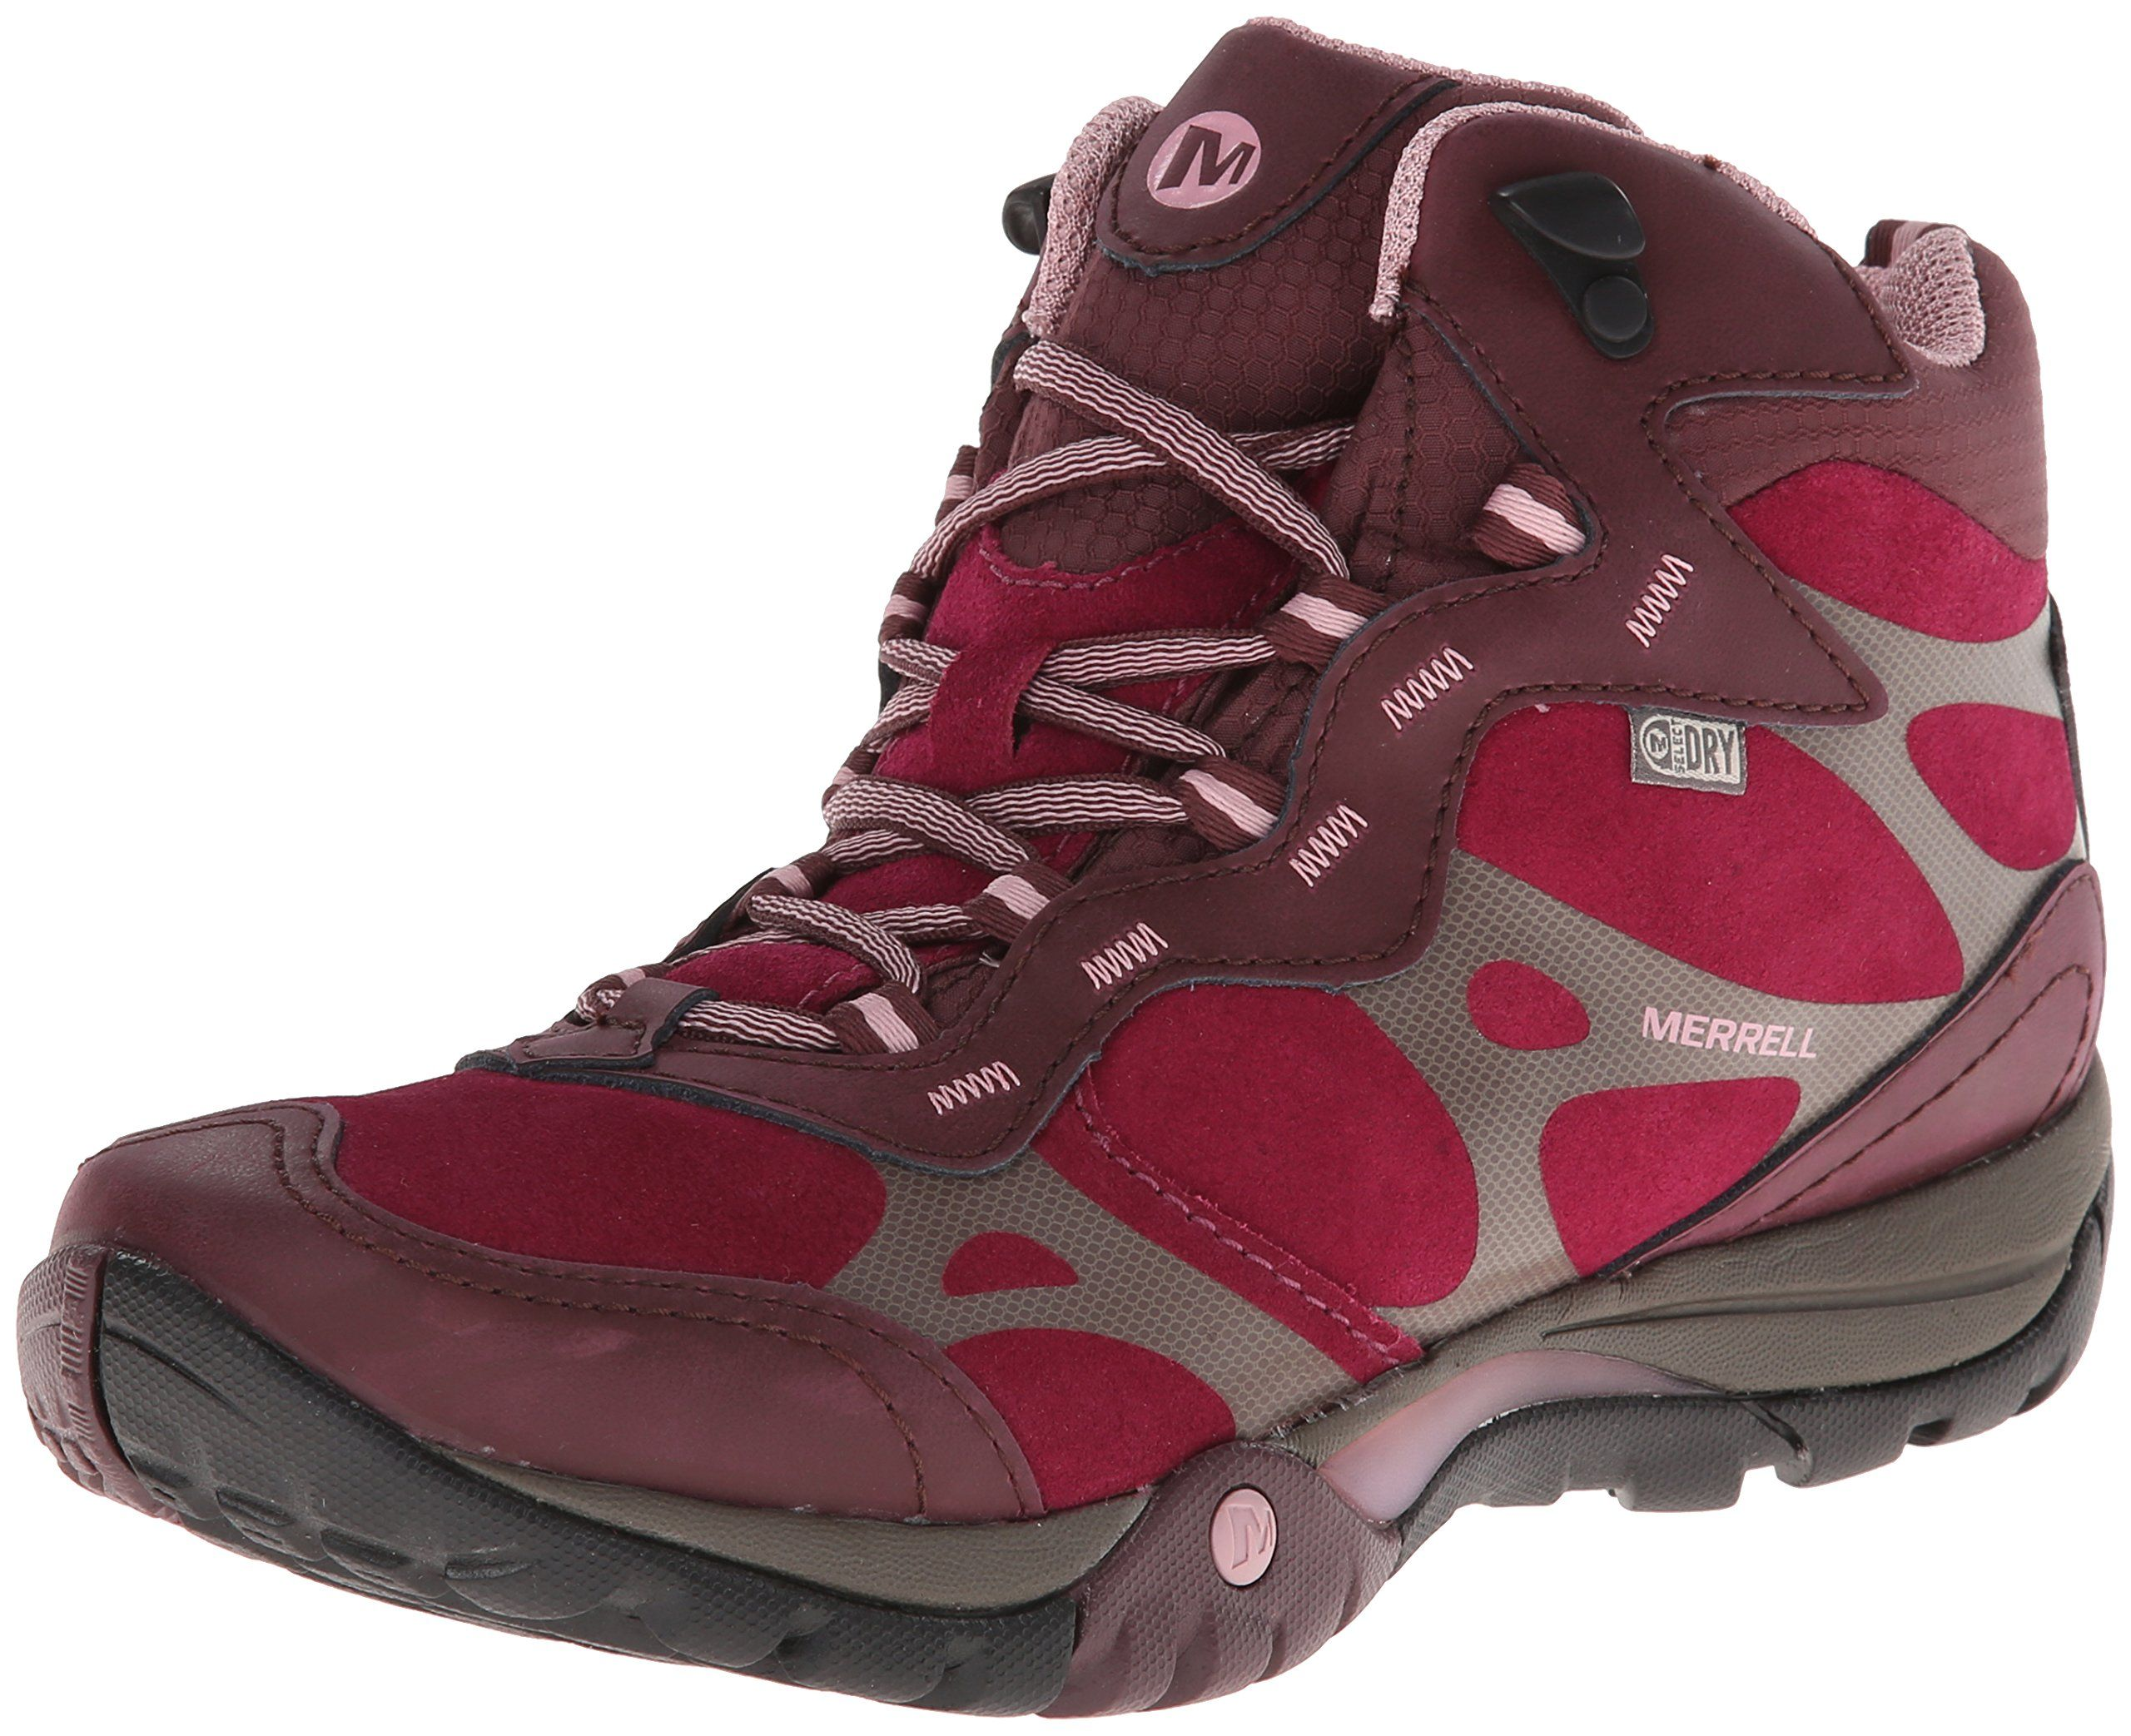 Merrell Women S Azura Carex Mid Waterproof Hiking Boot Wine 10 M Us Boots Waterproof Hiking Boots Hiking Boots